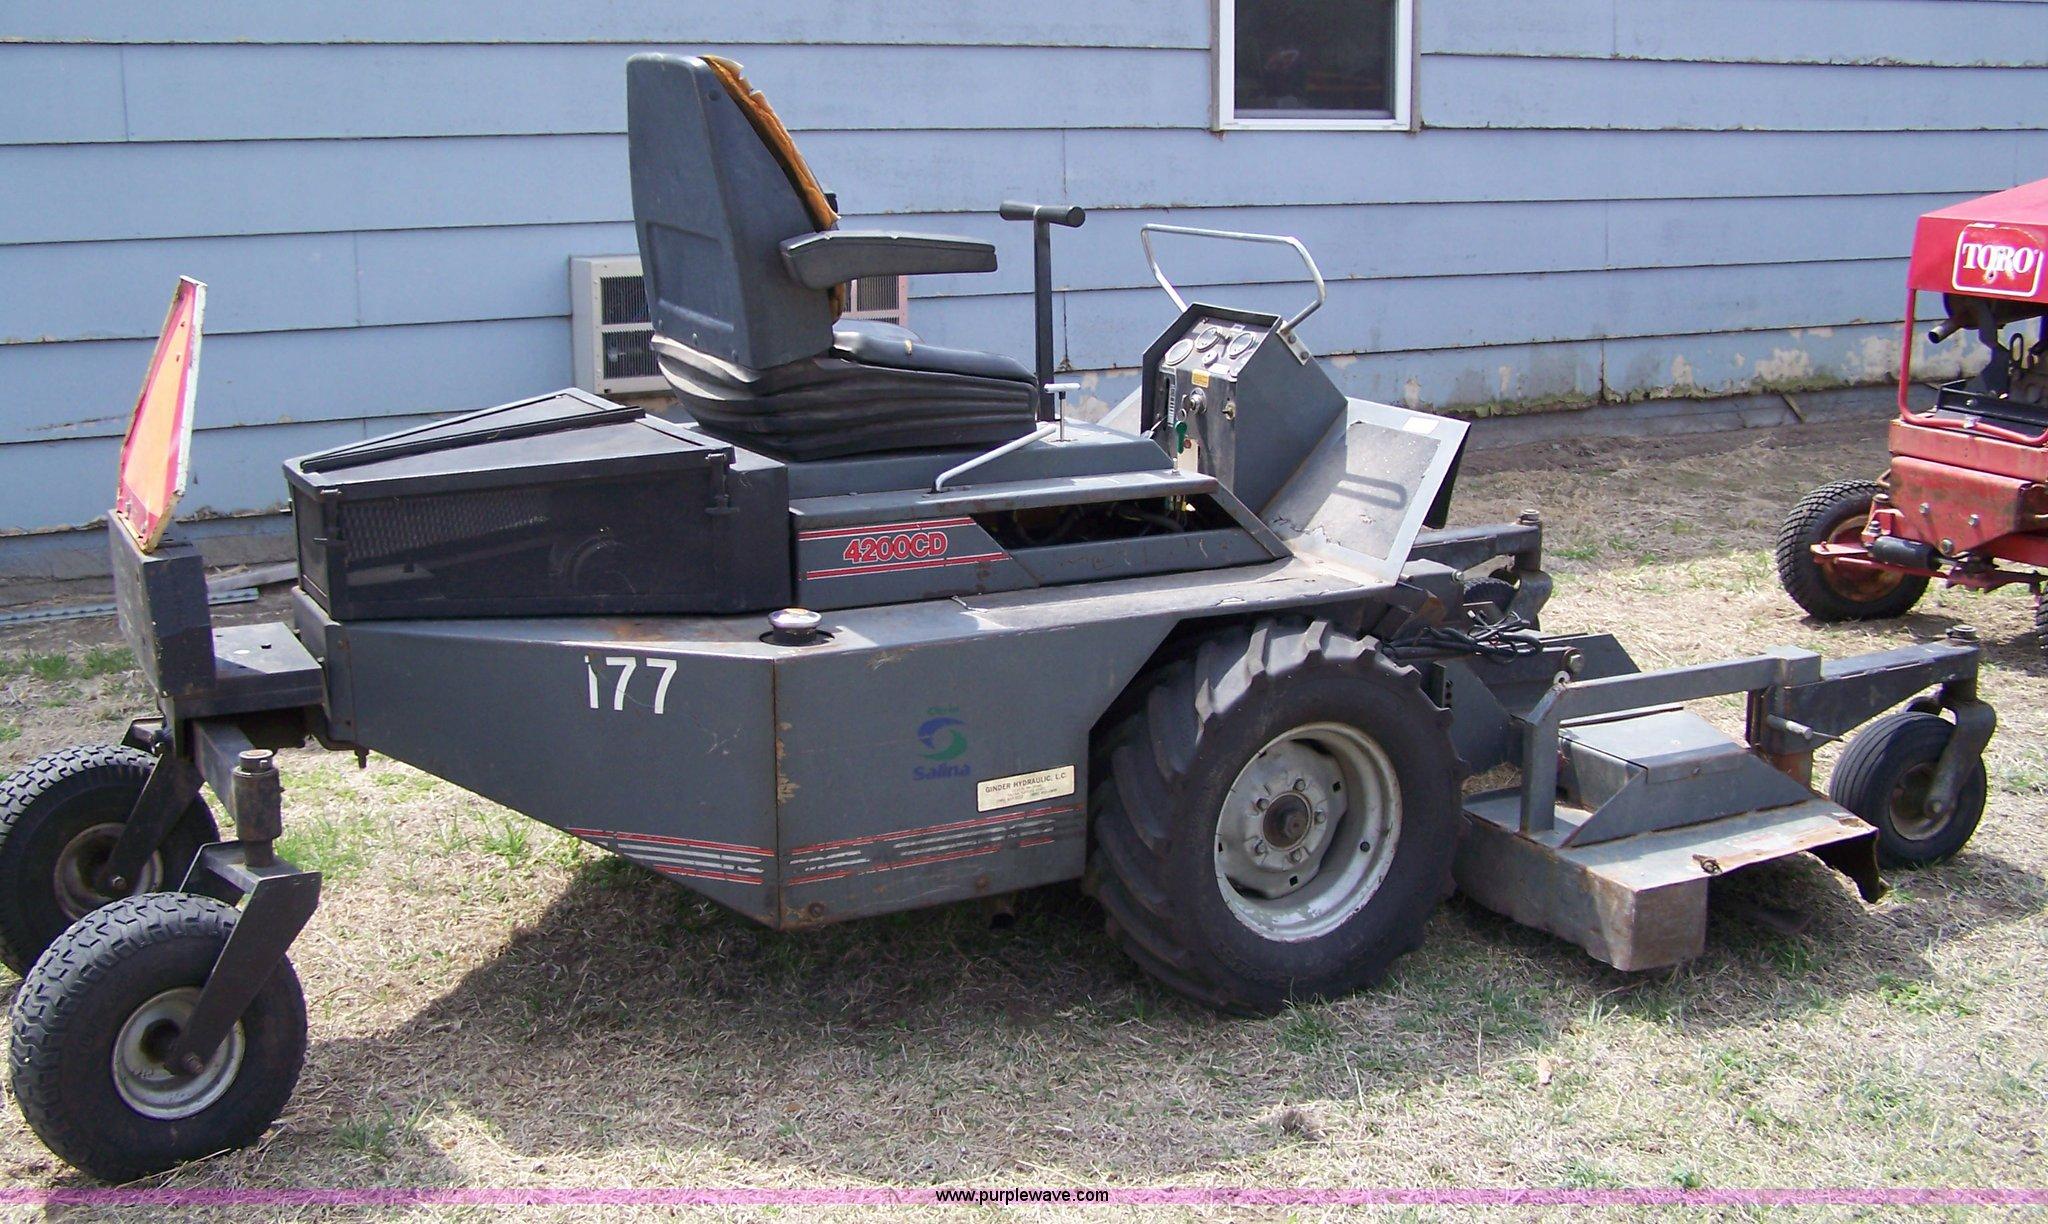 grazer g4200cd zero turn mower item 7474 sold may 18 mi rh purplewave com Grazer Mower 52 Grazer Zero Turn Mower Parts